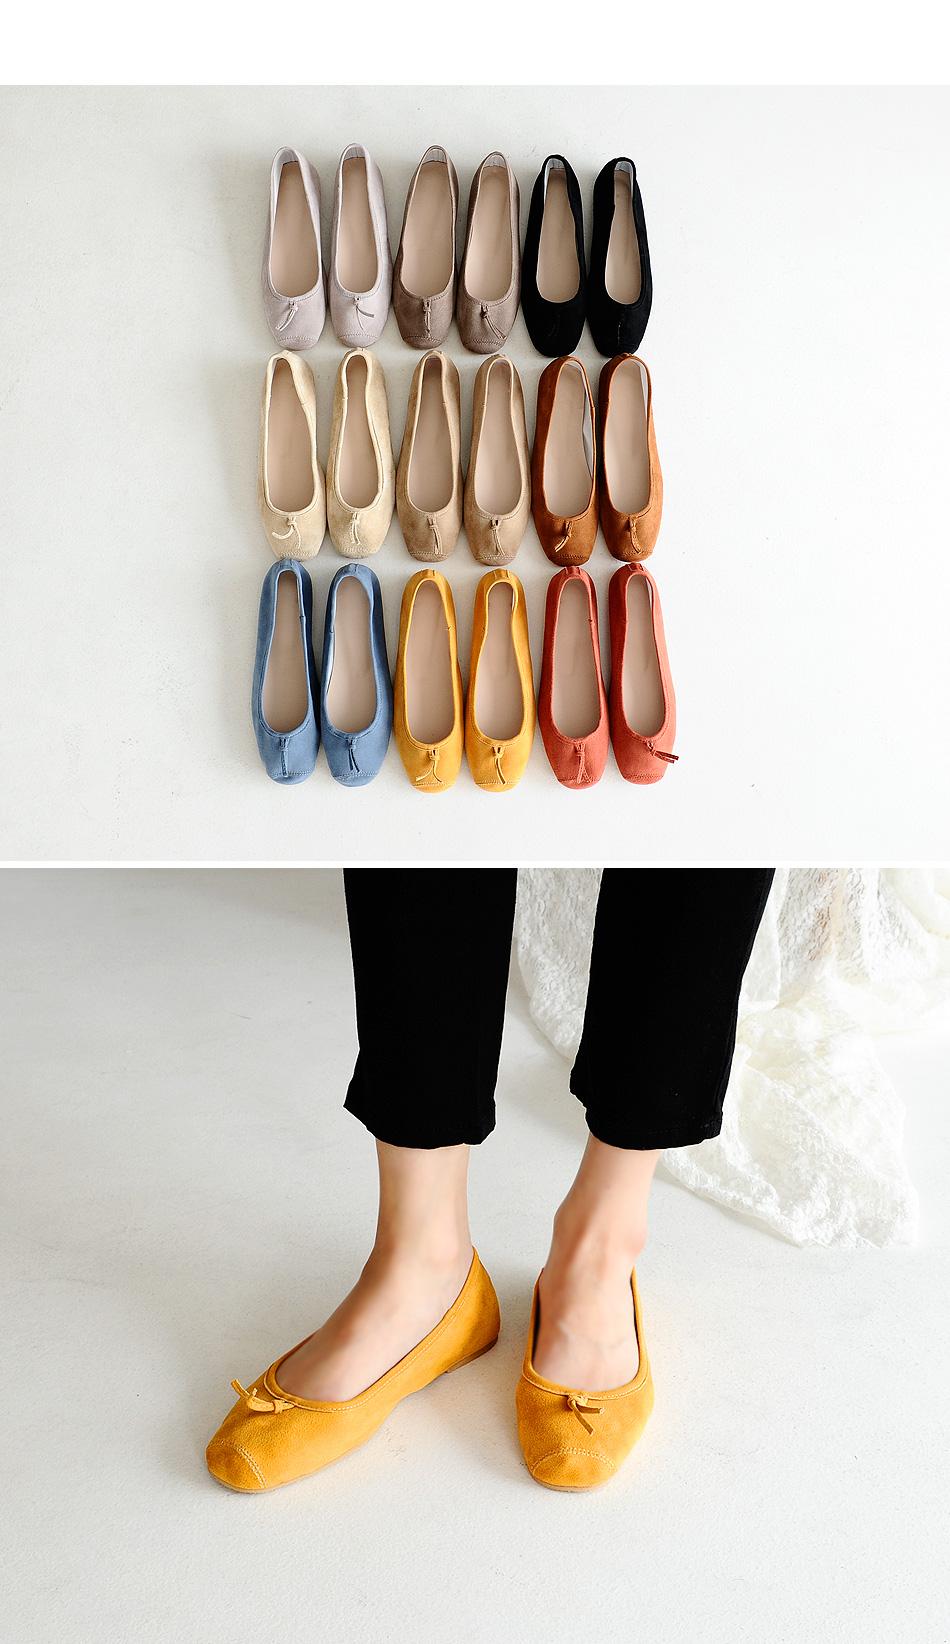 TIPOEL Flat Shoes 1cm